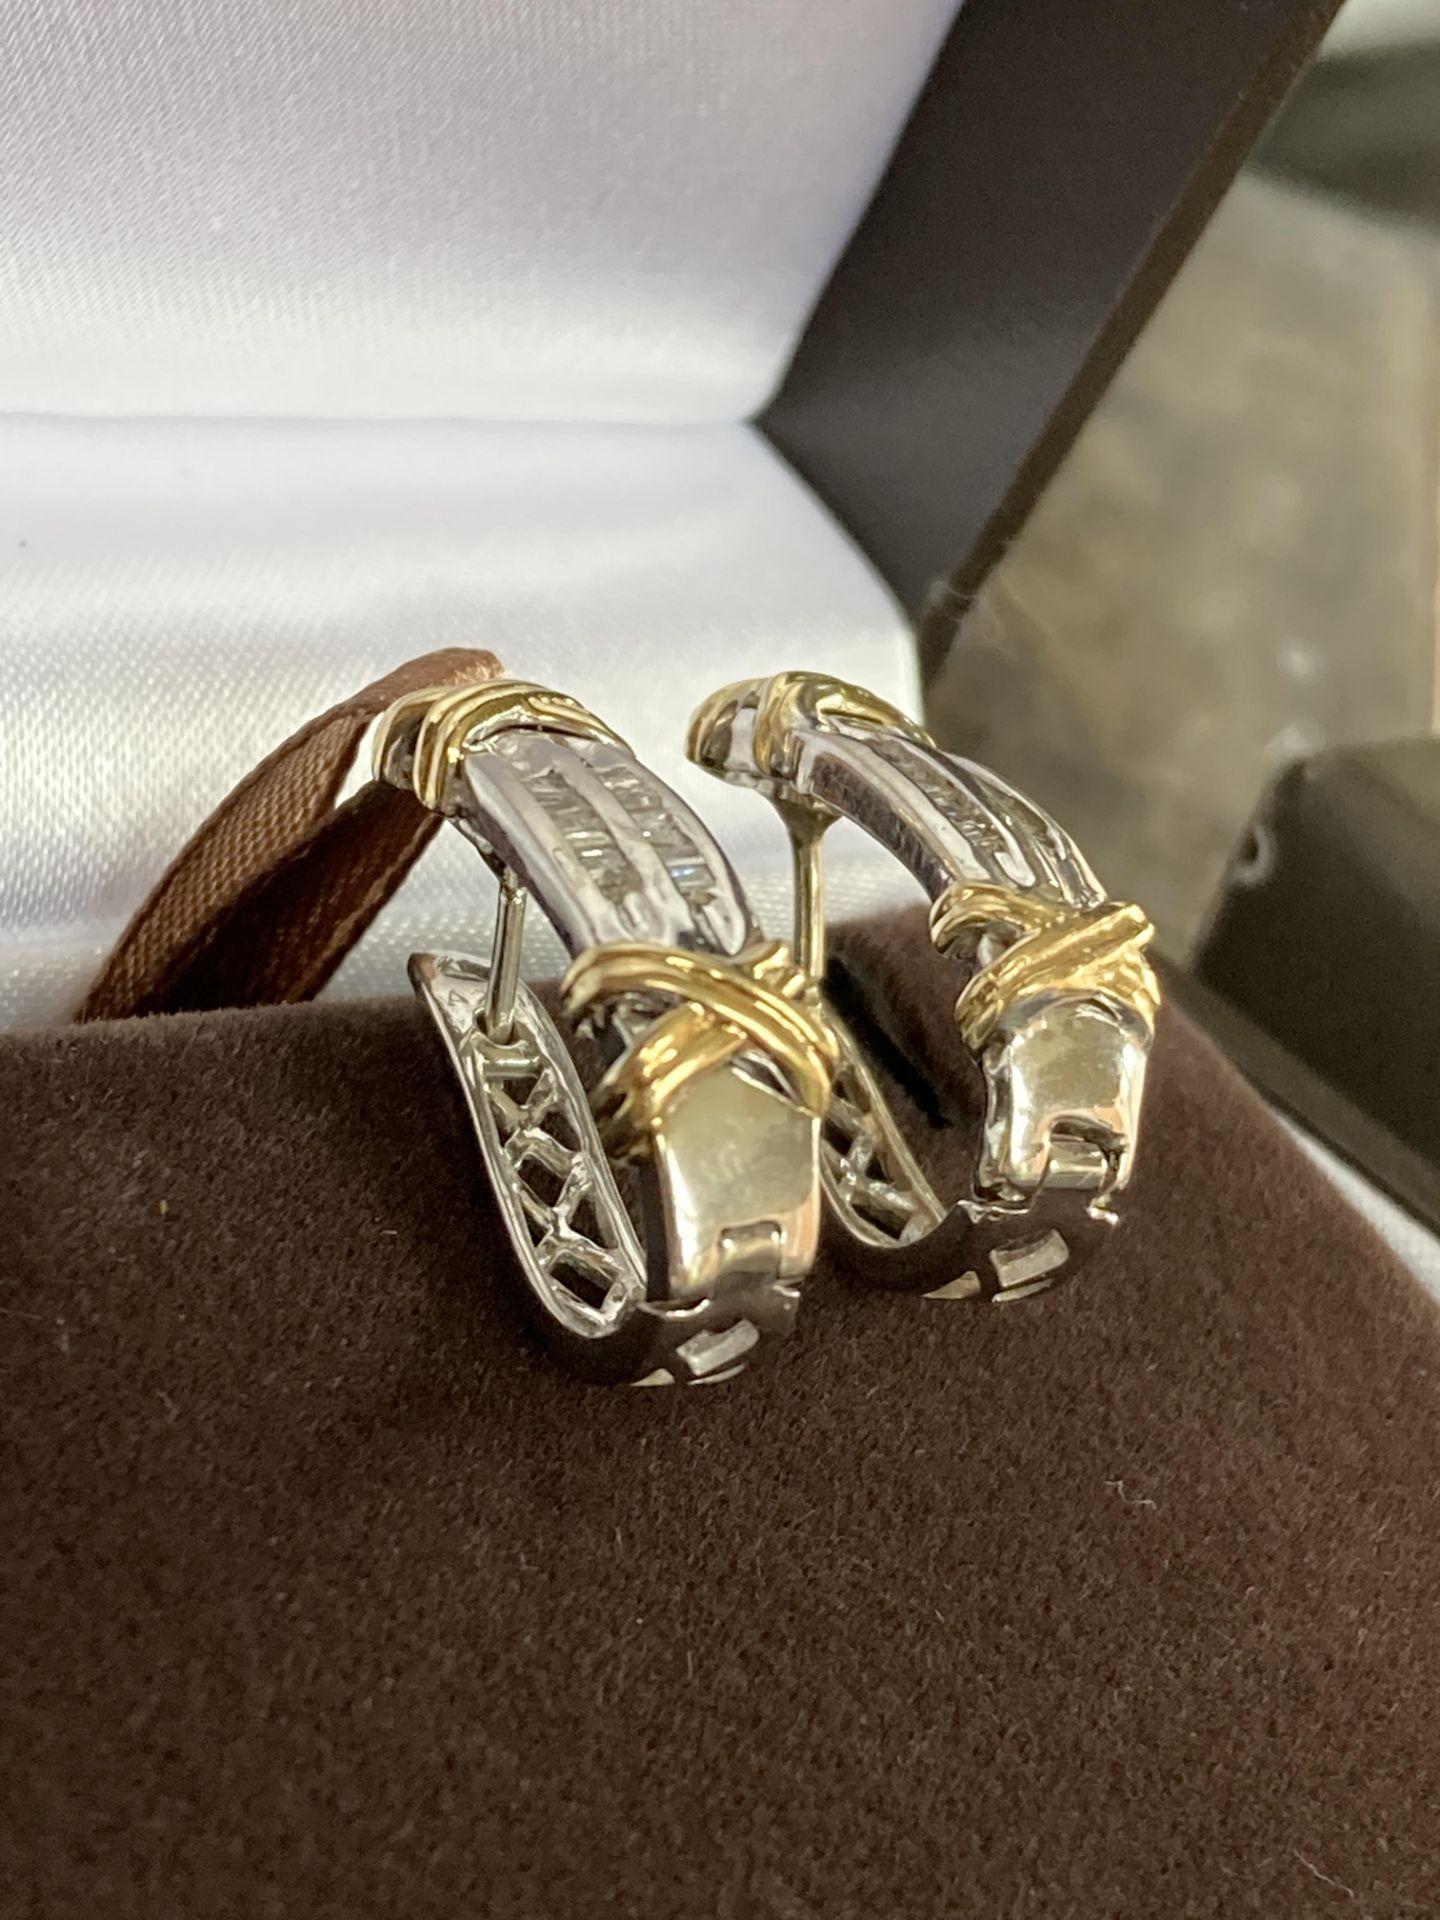 DIAMOND 14K EARRINGS - 0.4CT - Image 3 of 3